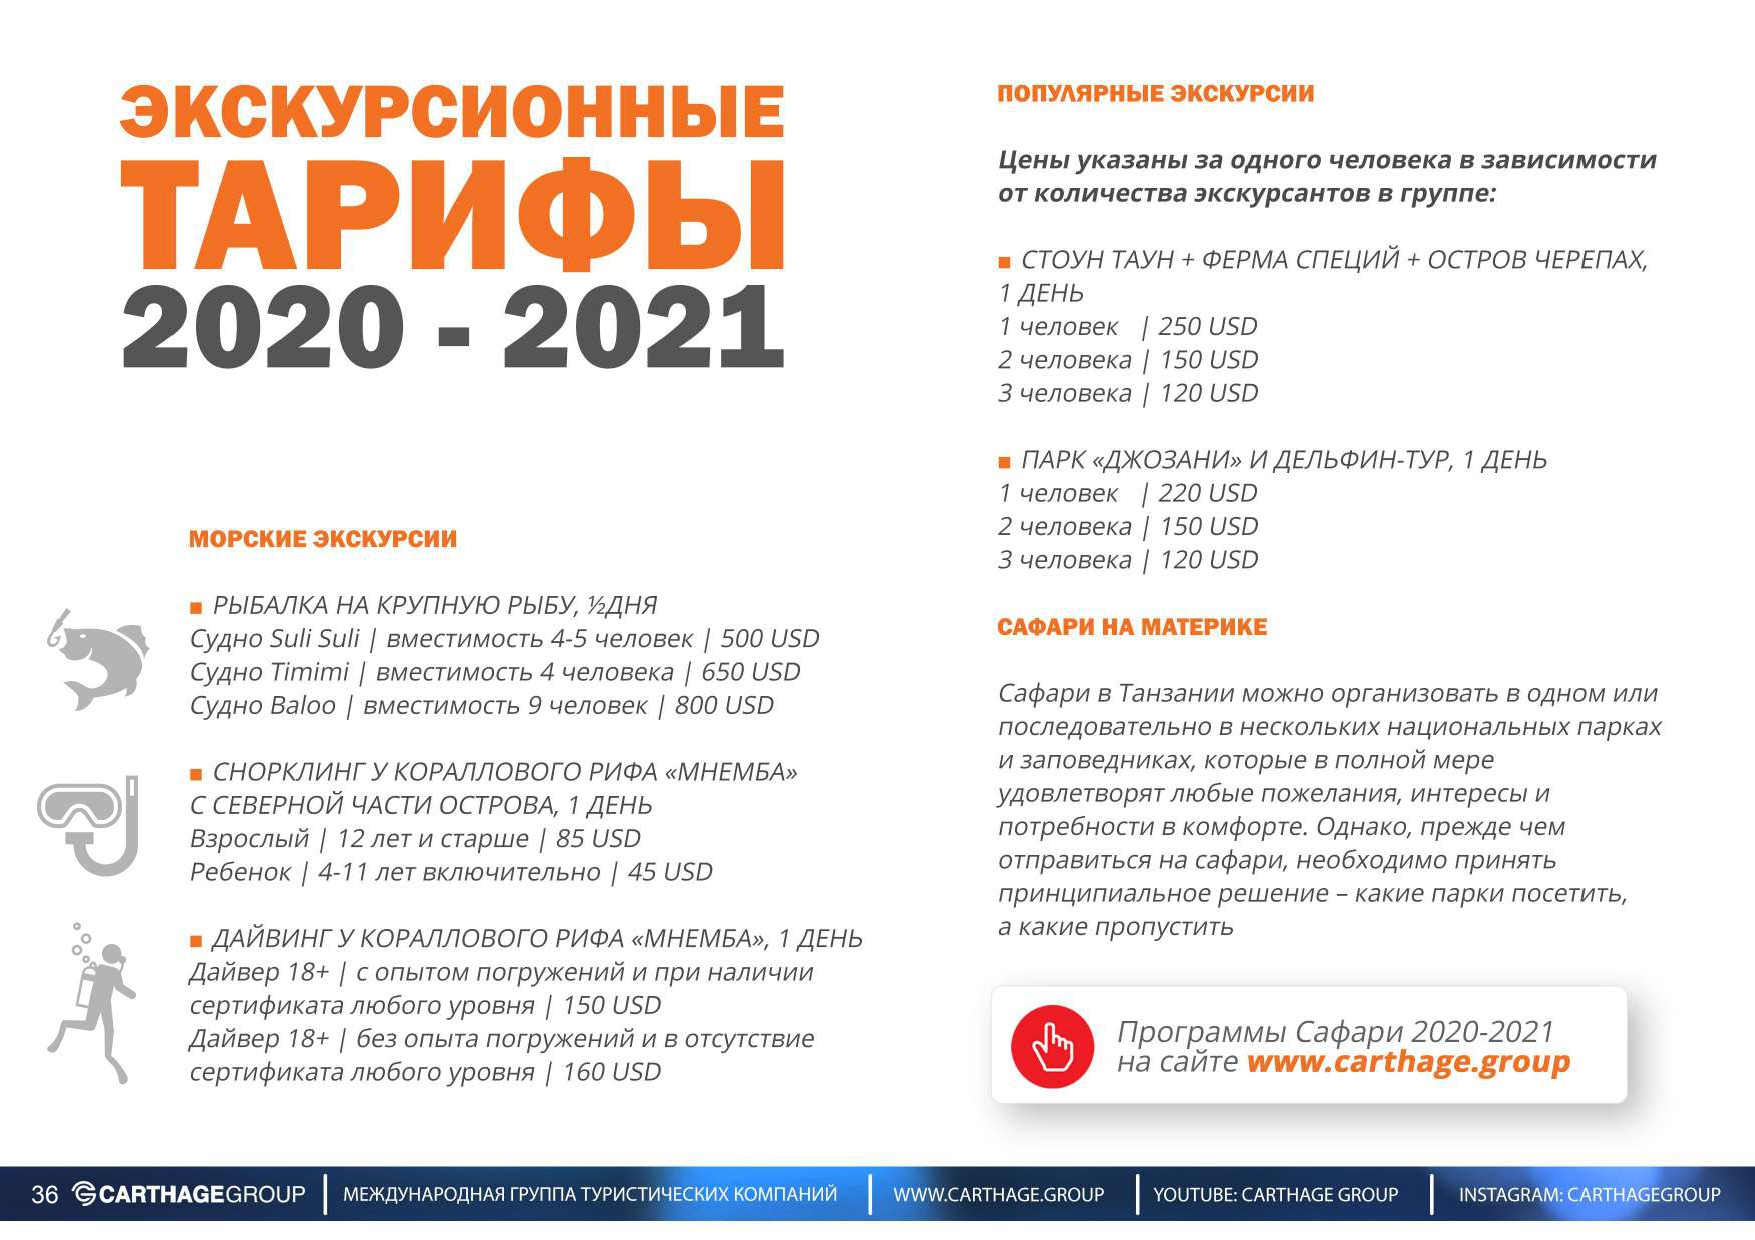 27.11 - Zanzibar Presentation 2020-2021_page-0036